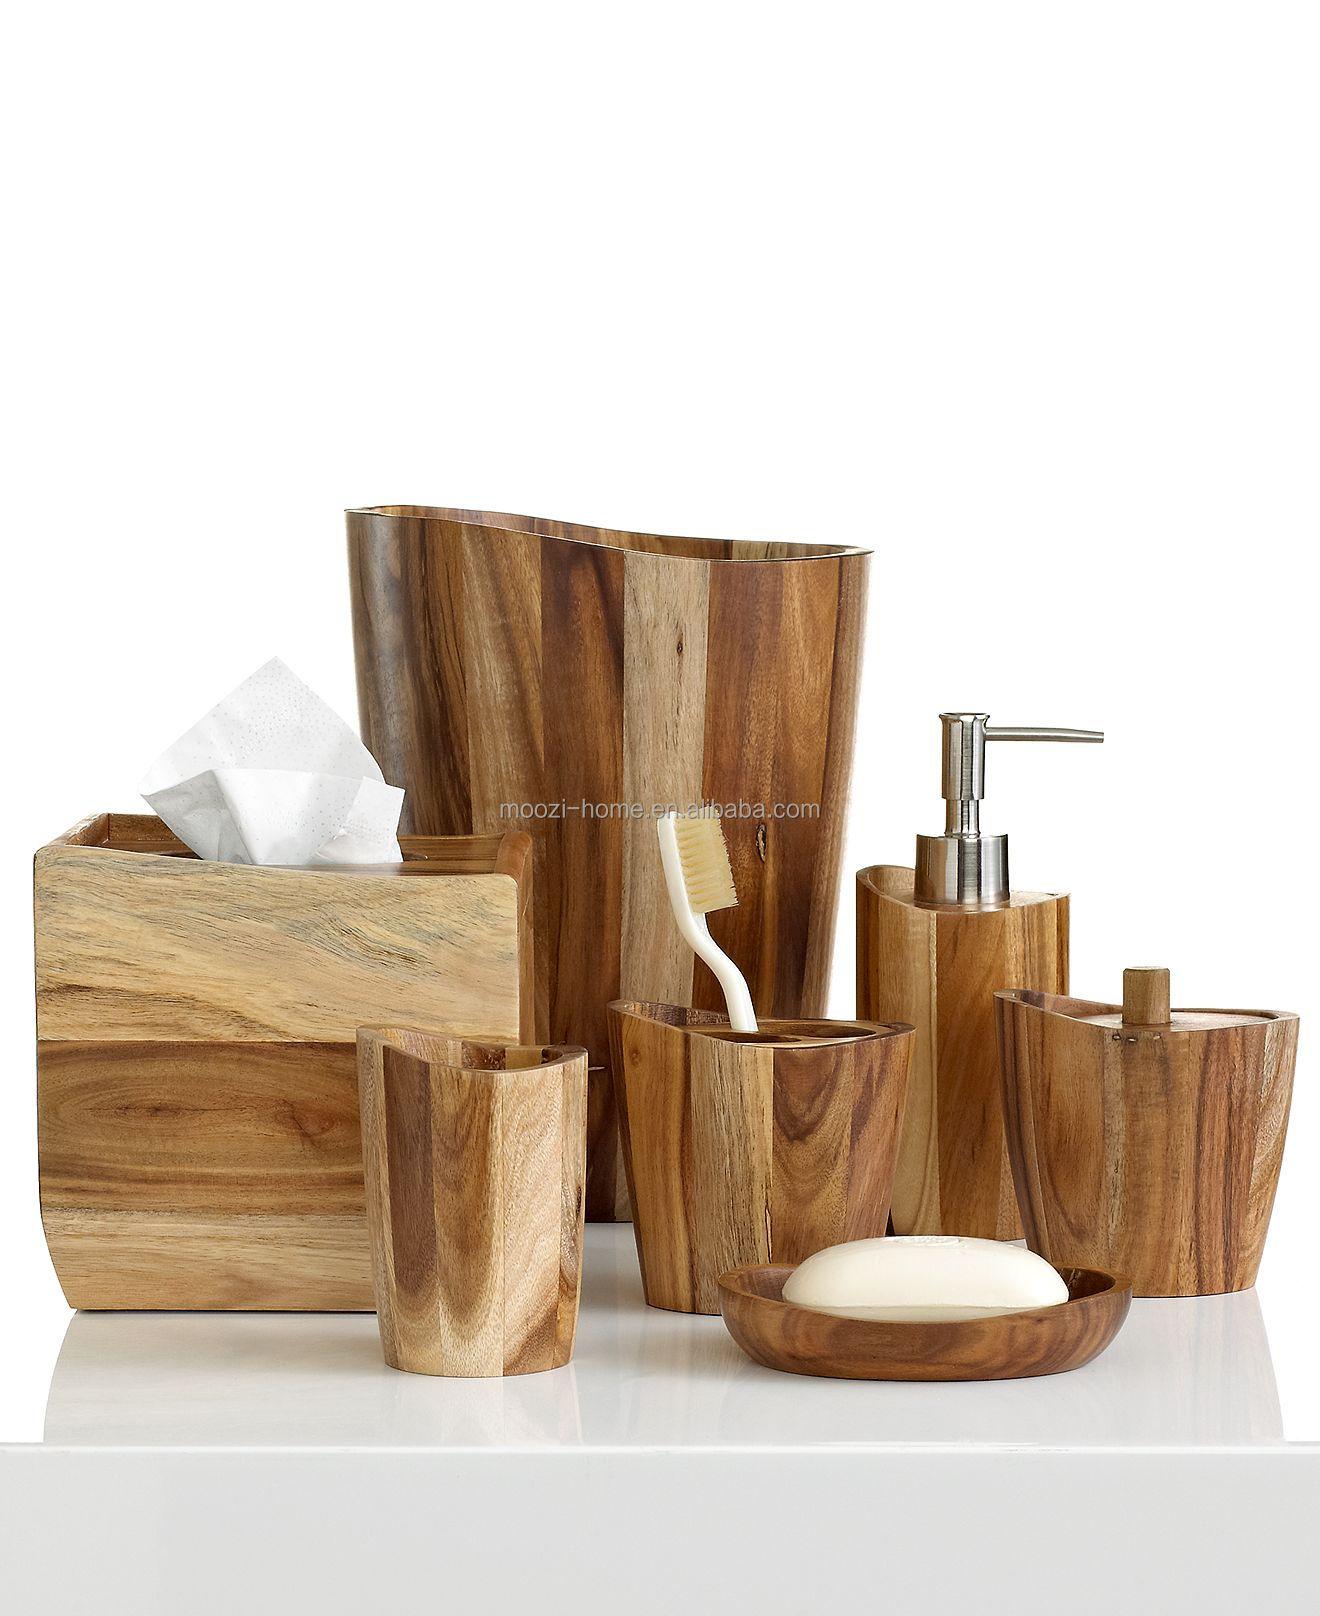 Natural Wooden Bath Sets,Wood Bathroom Accessories